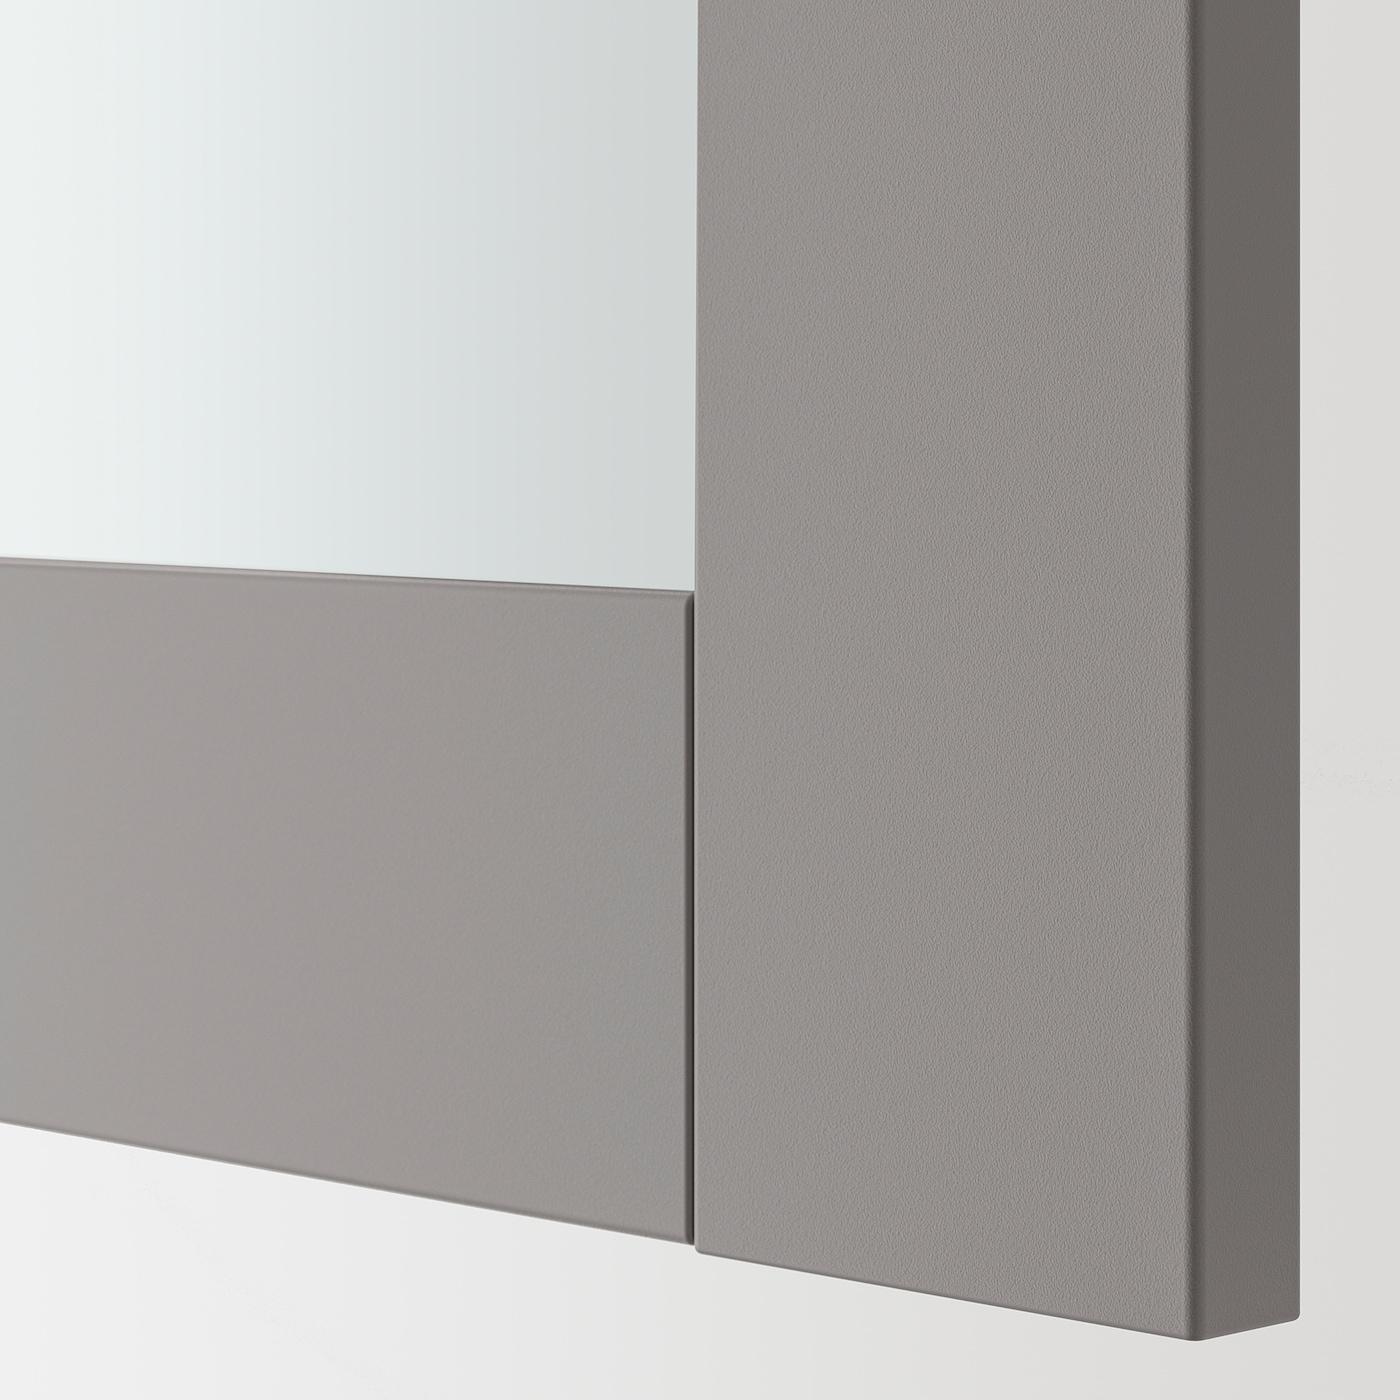 ENHET خزانة بمرآة مع بابين, رمادي/رمادي هيكل, 60x17x75 سم